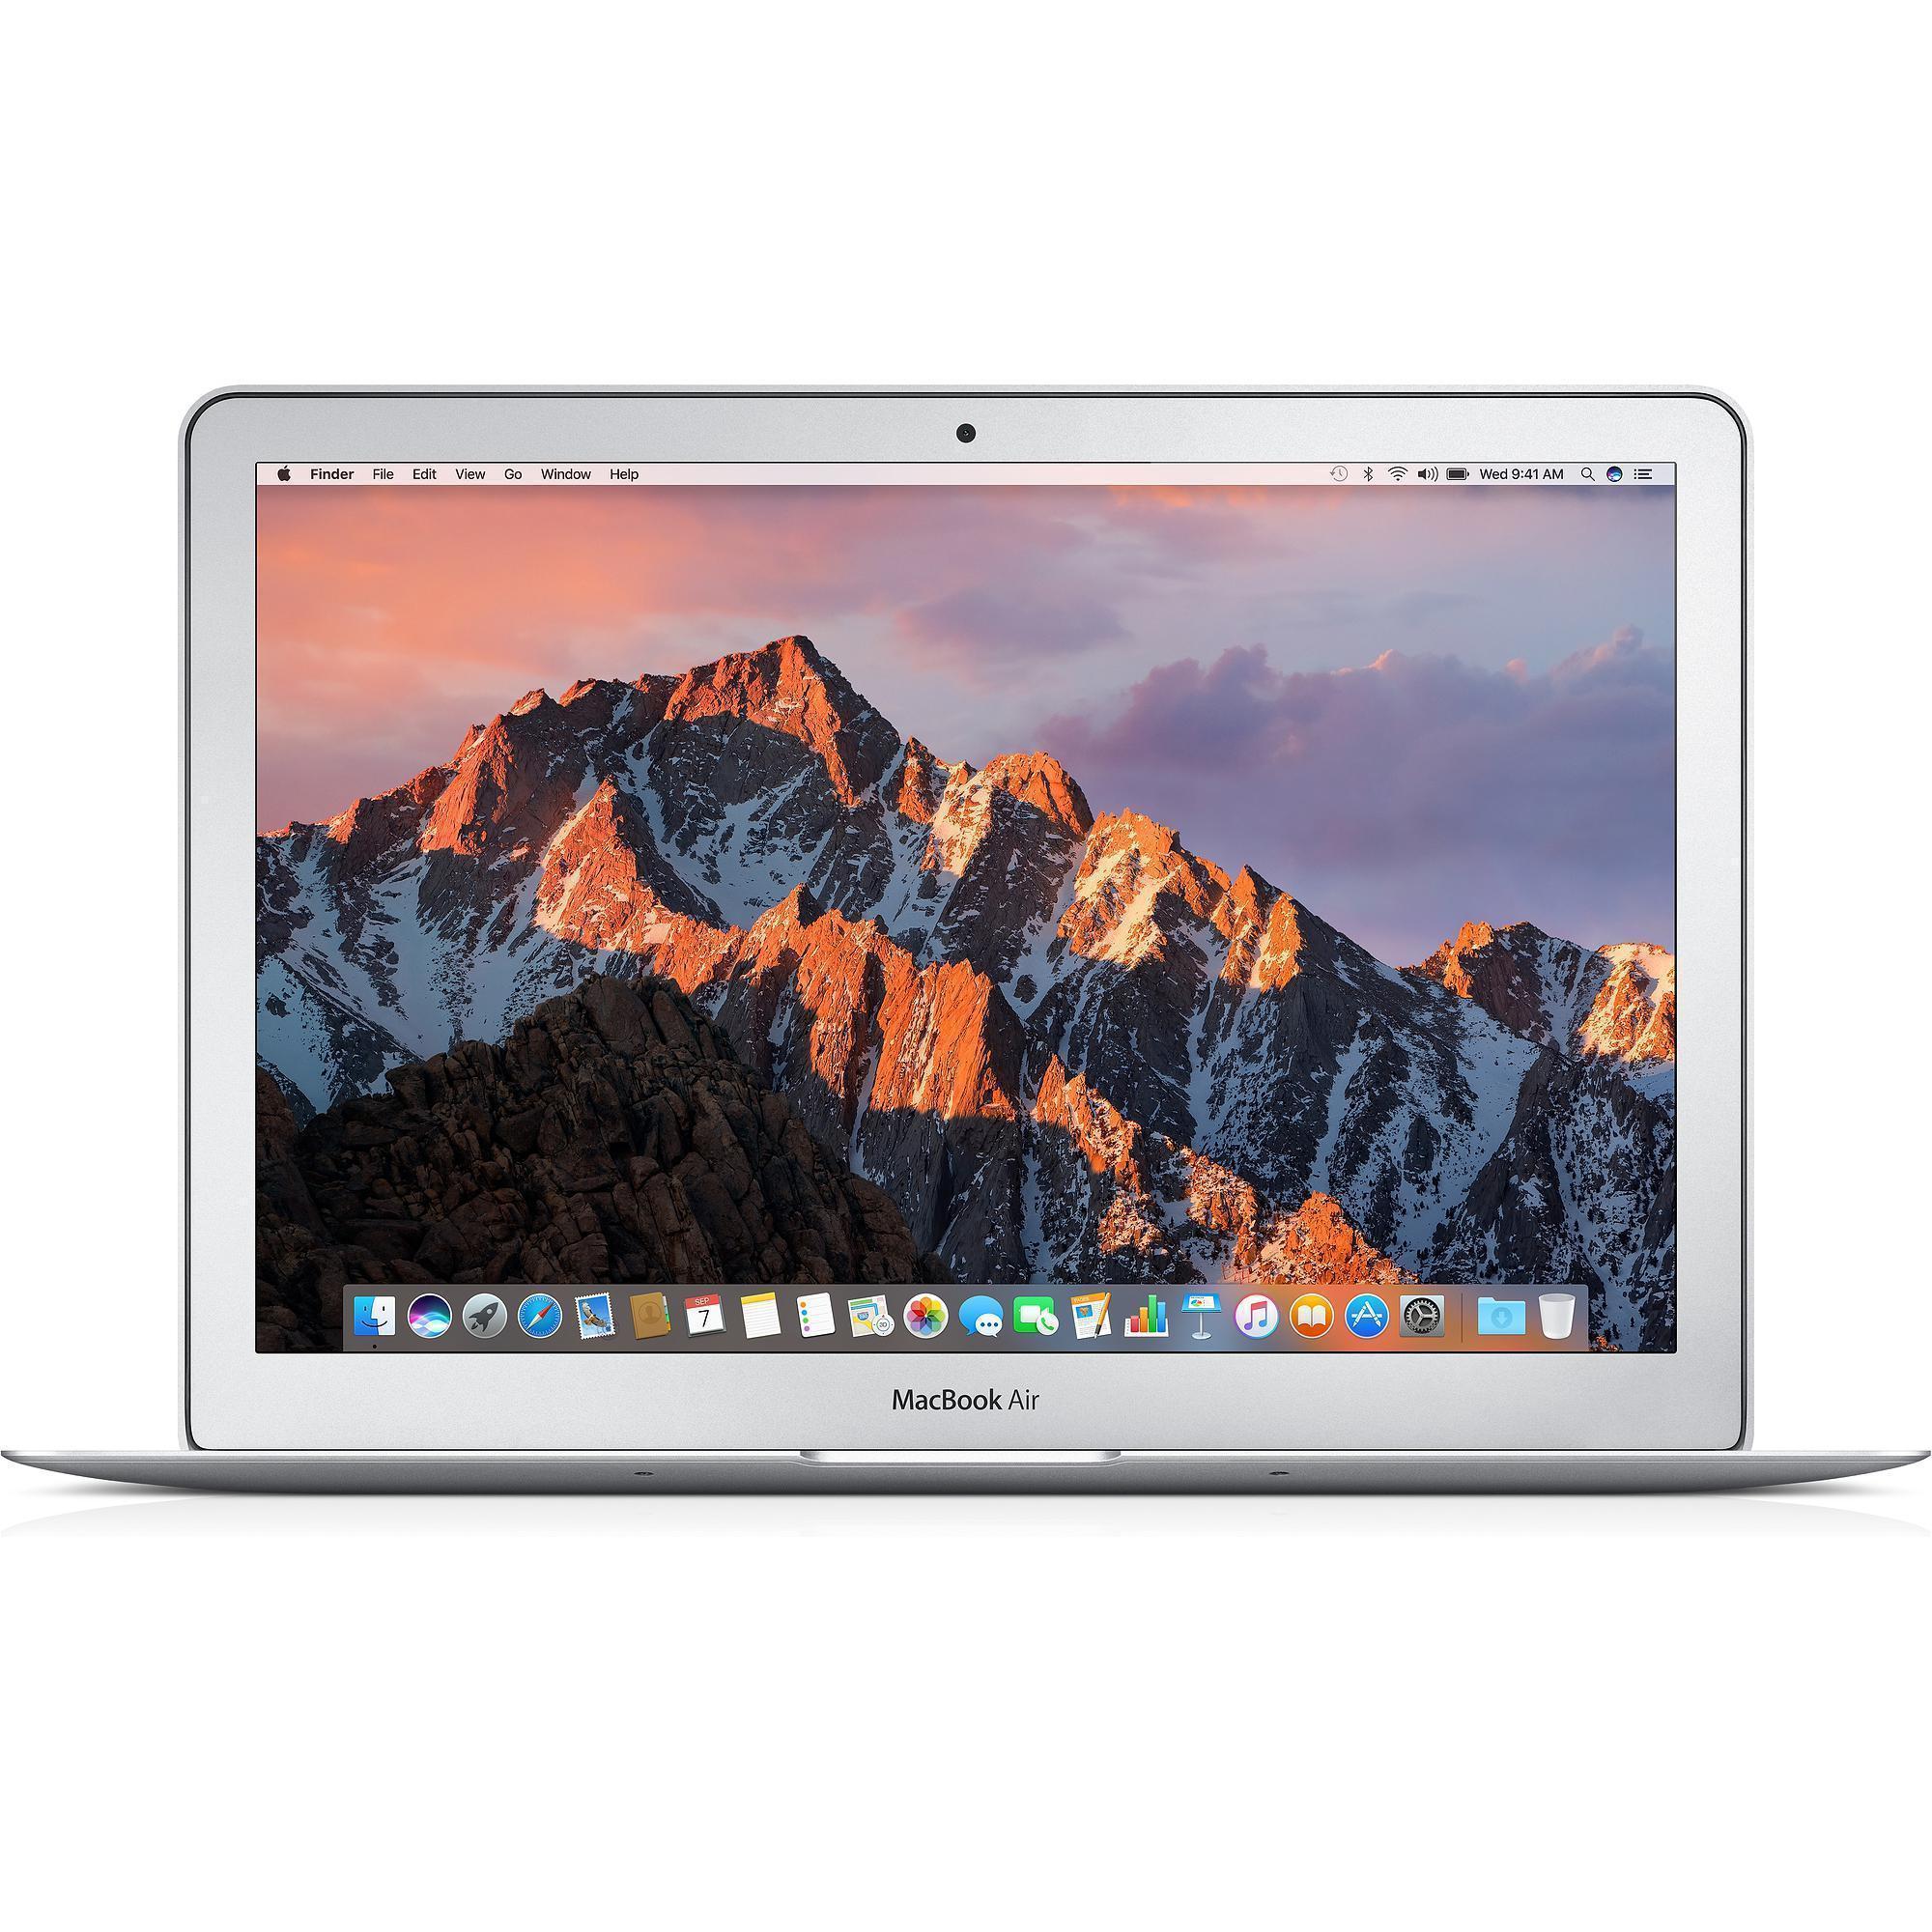 MacBook Air 13.3-inch (2013) - Core i5 - 4GB - SSD 256 GB QWERTZ - German